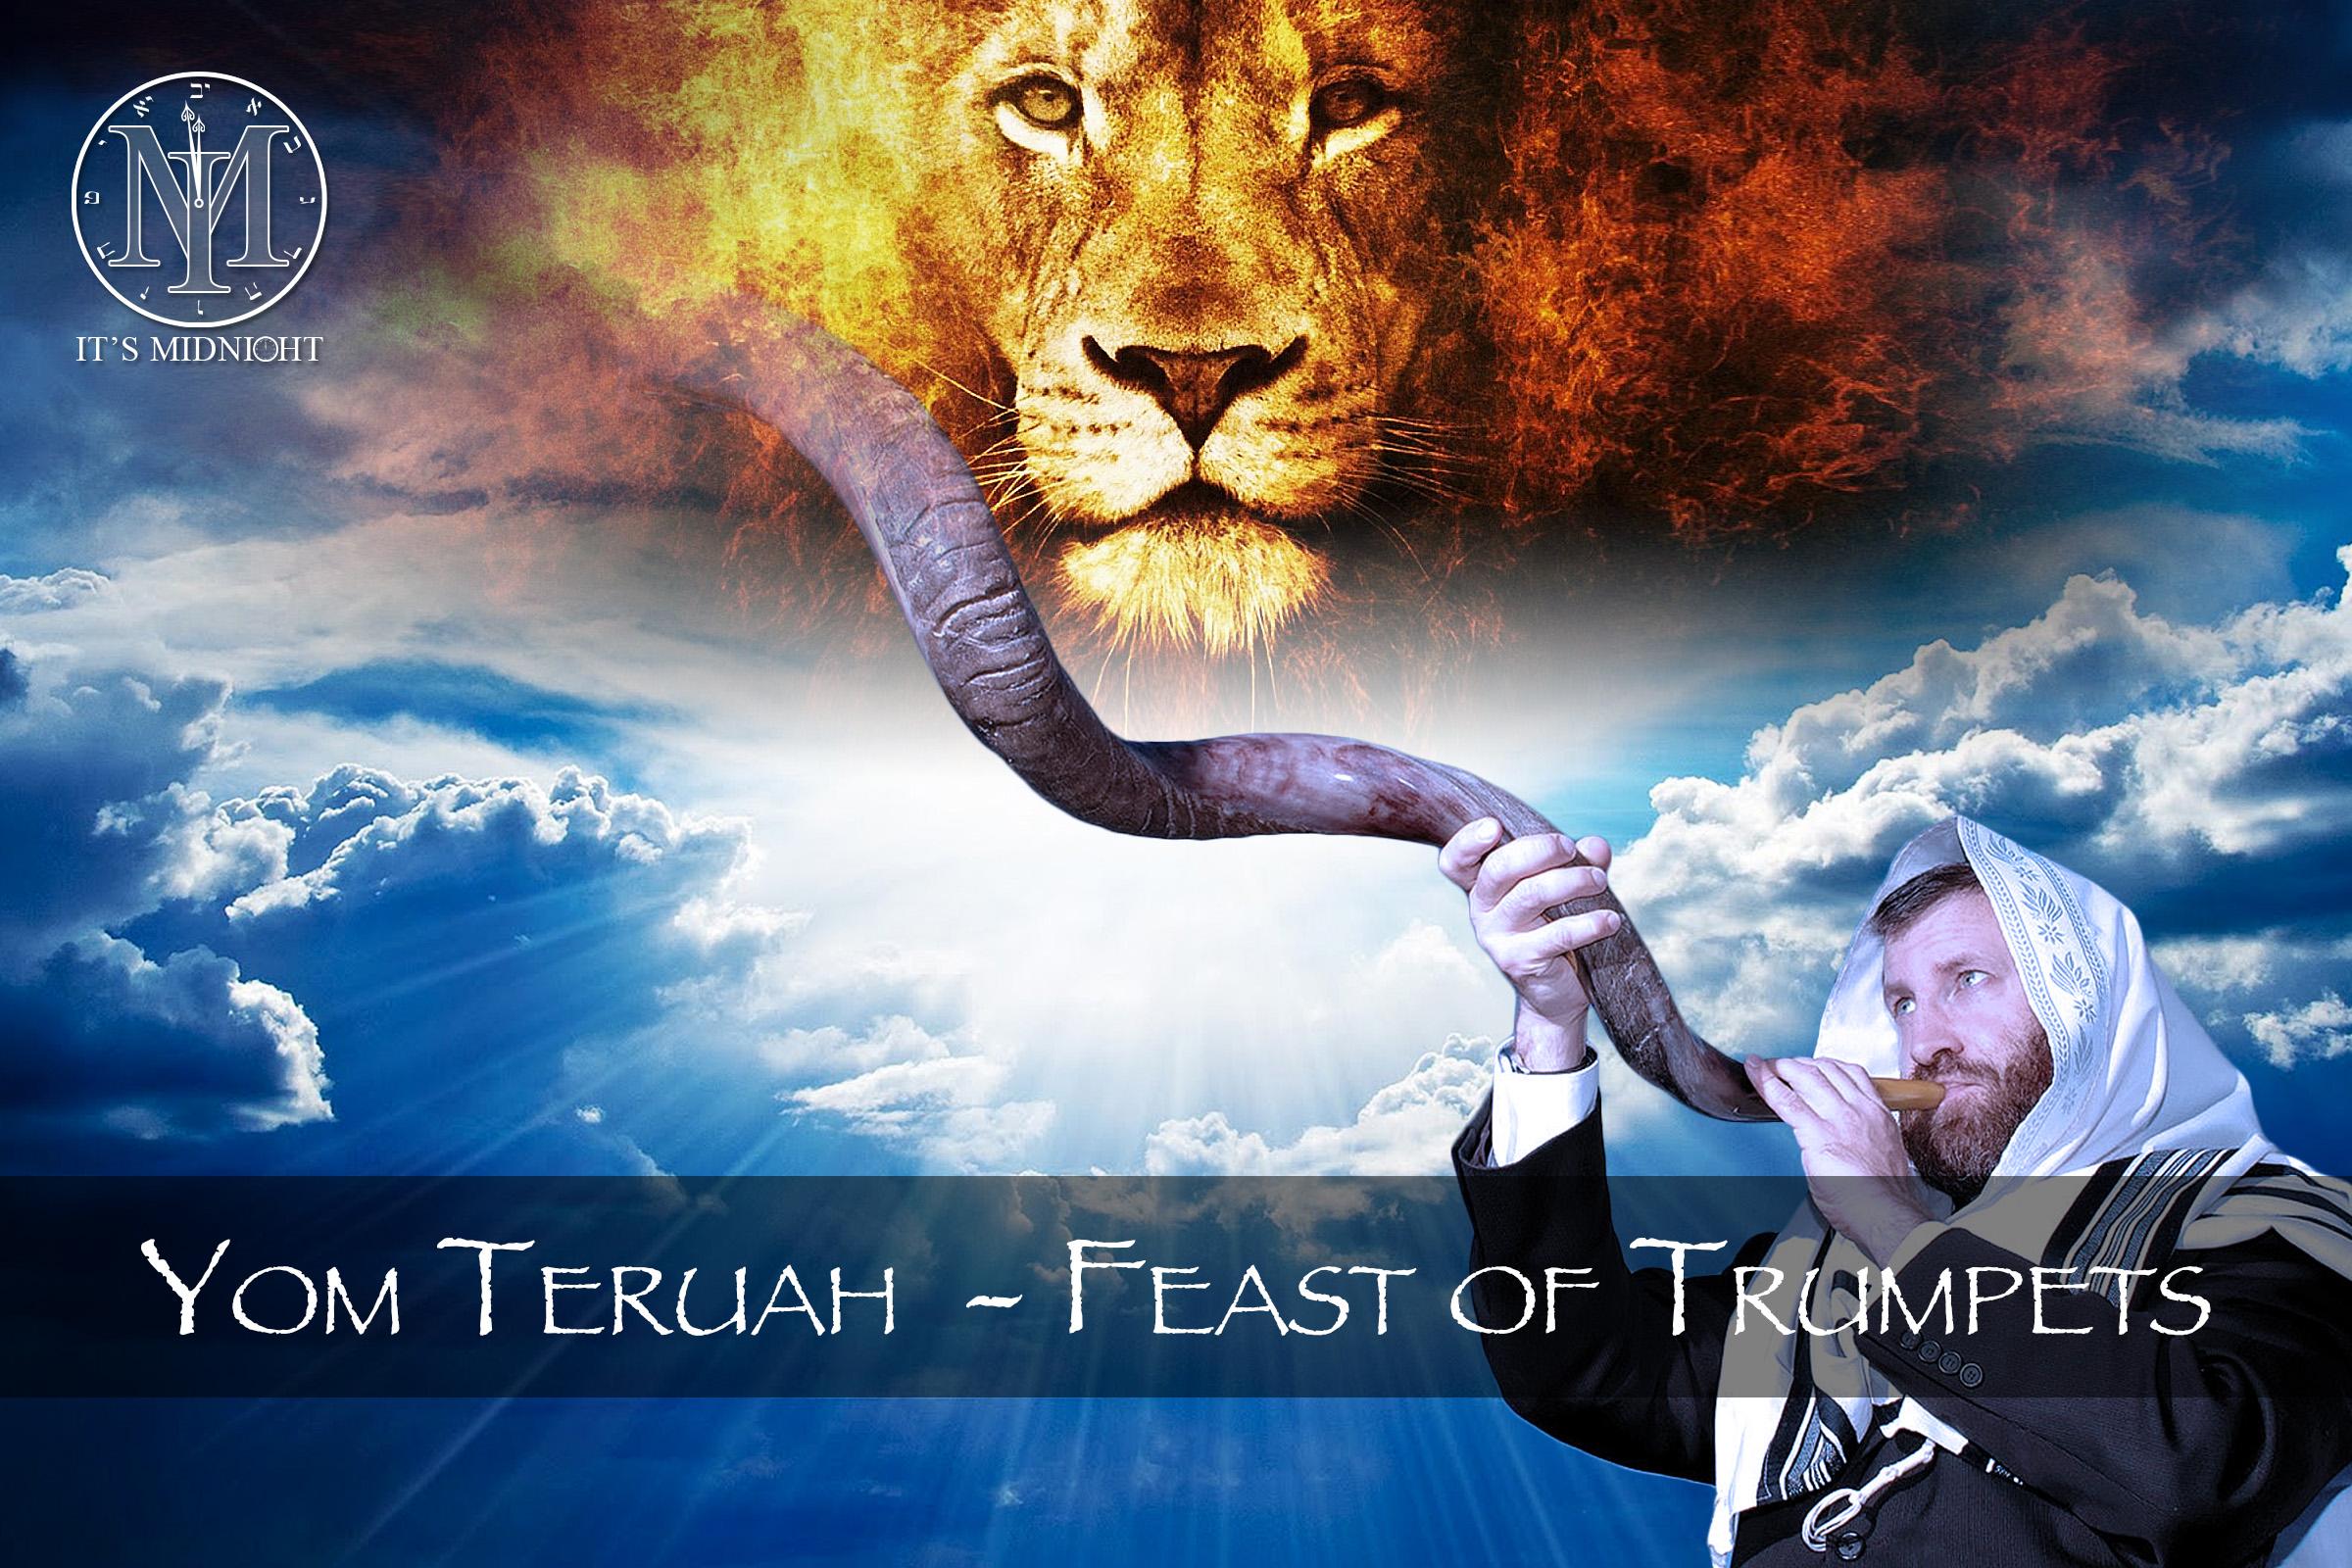 Yom Teruah - The Feast of Trumpets.jpg